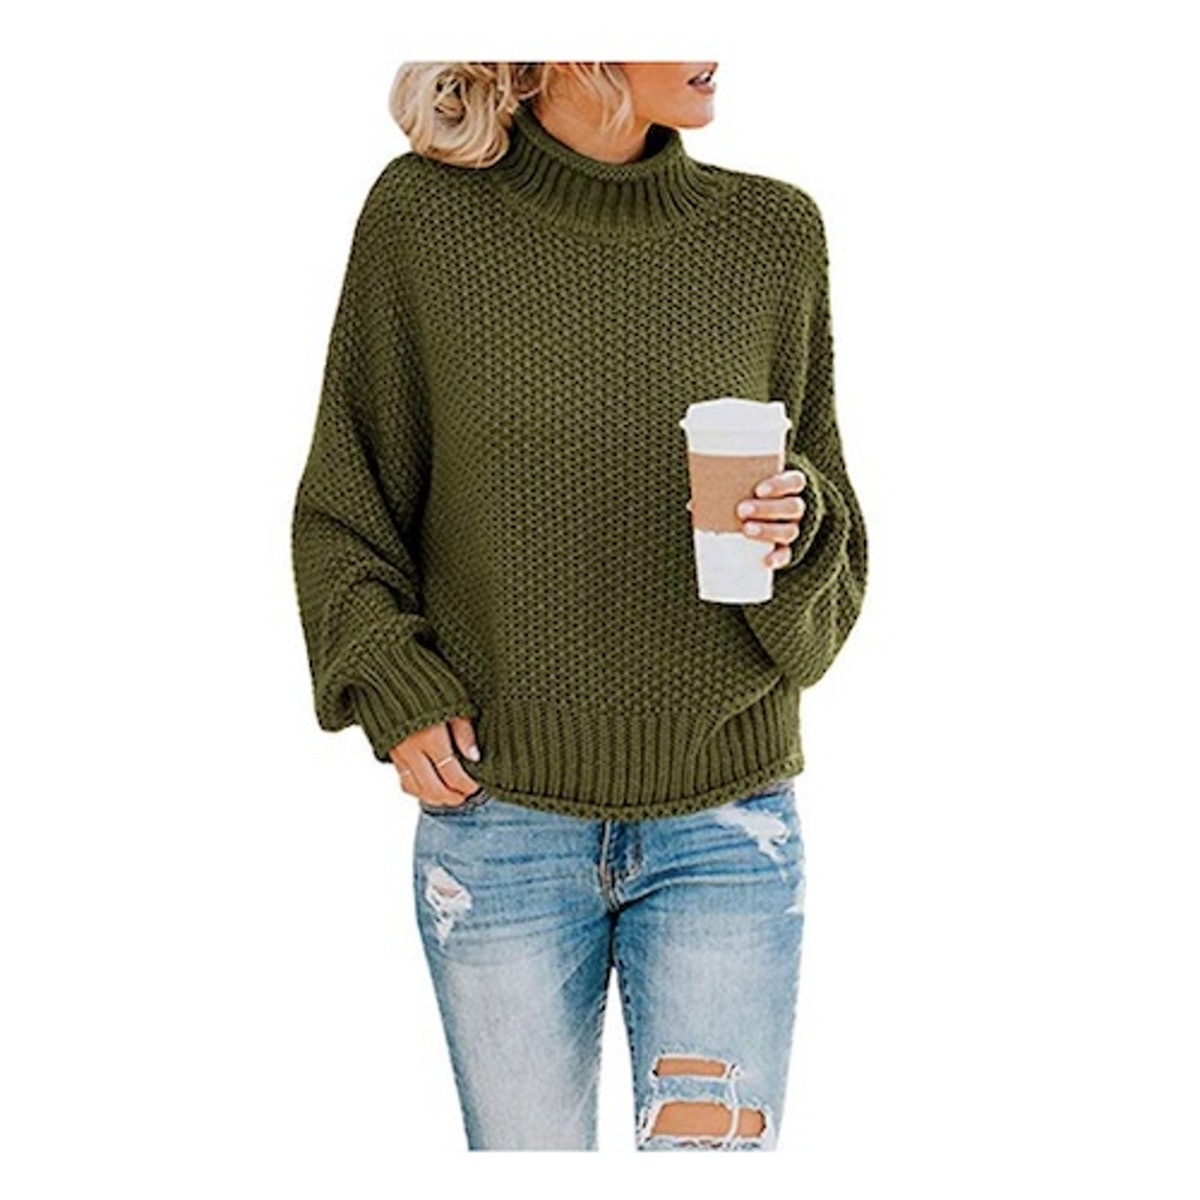 Saodimallsu Womens Turtleneck Sweater